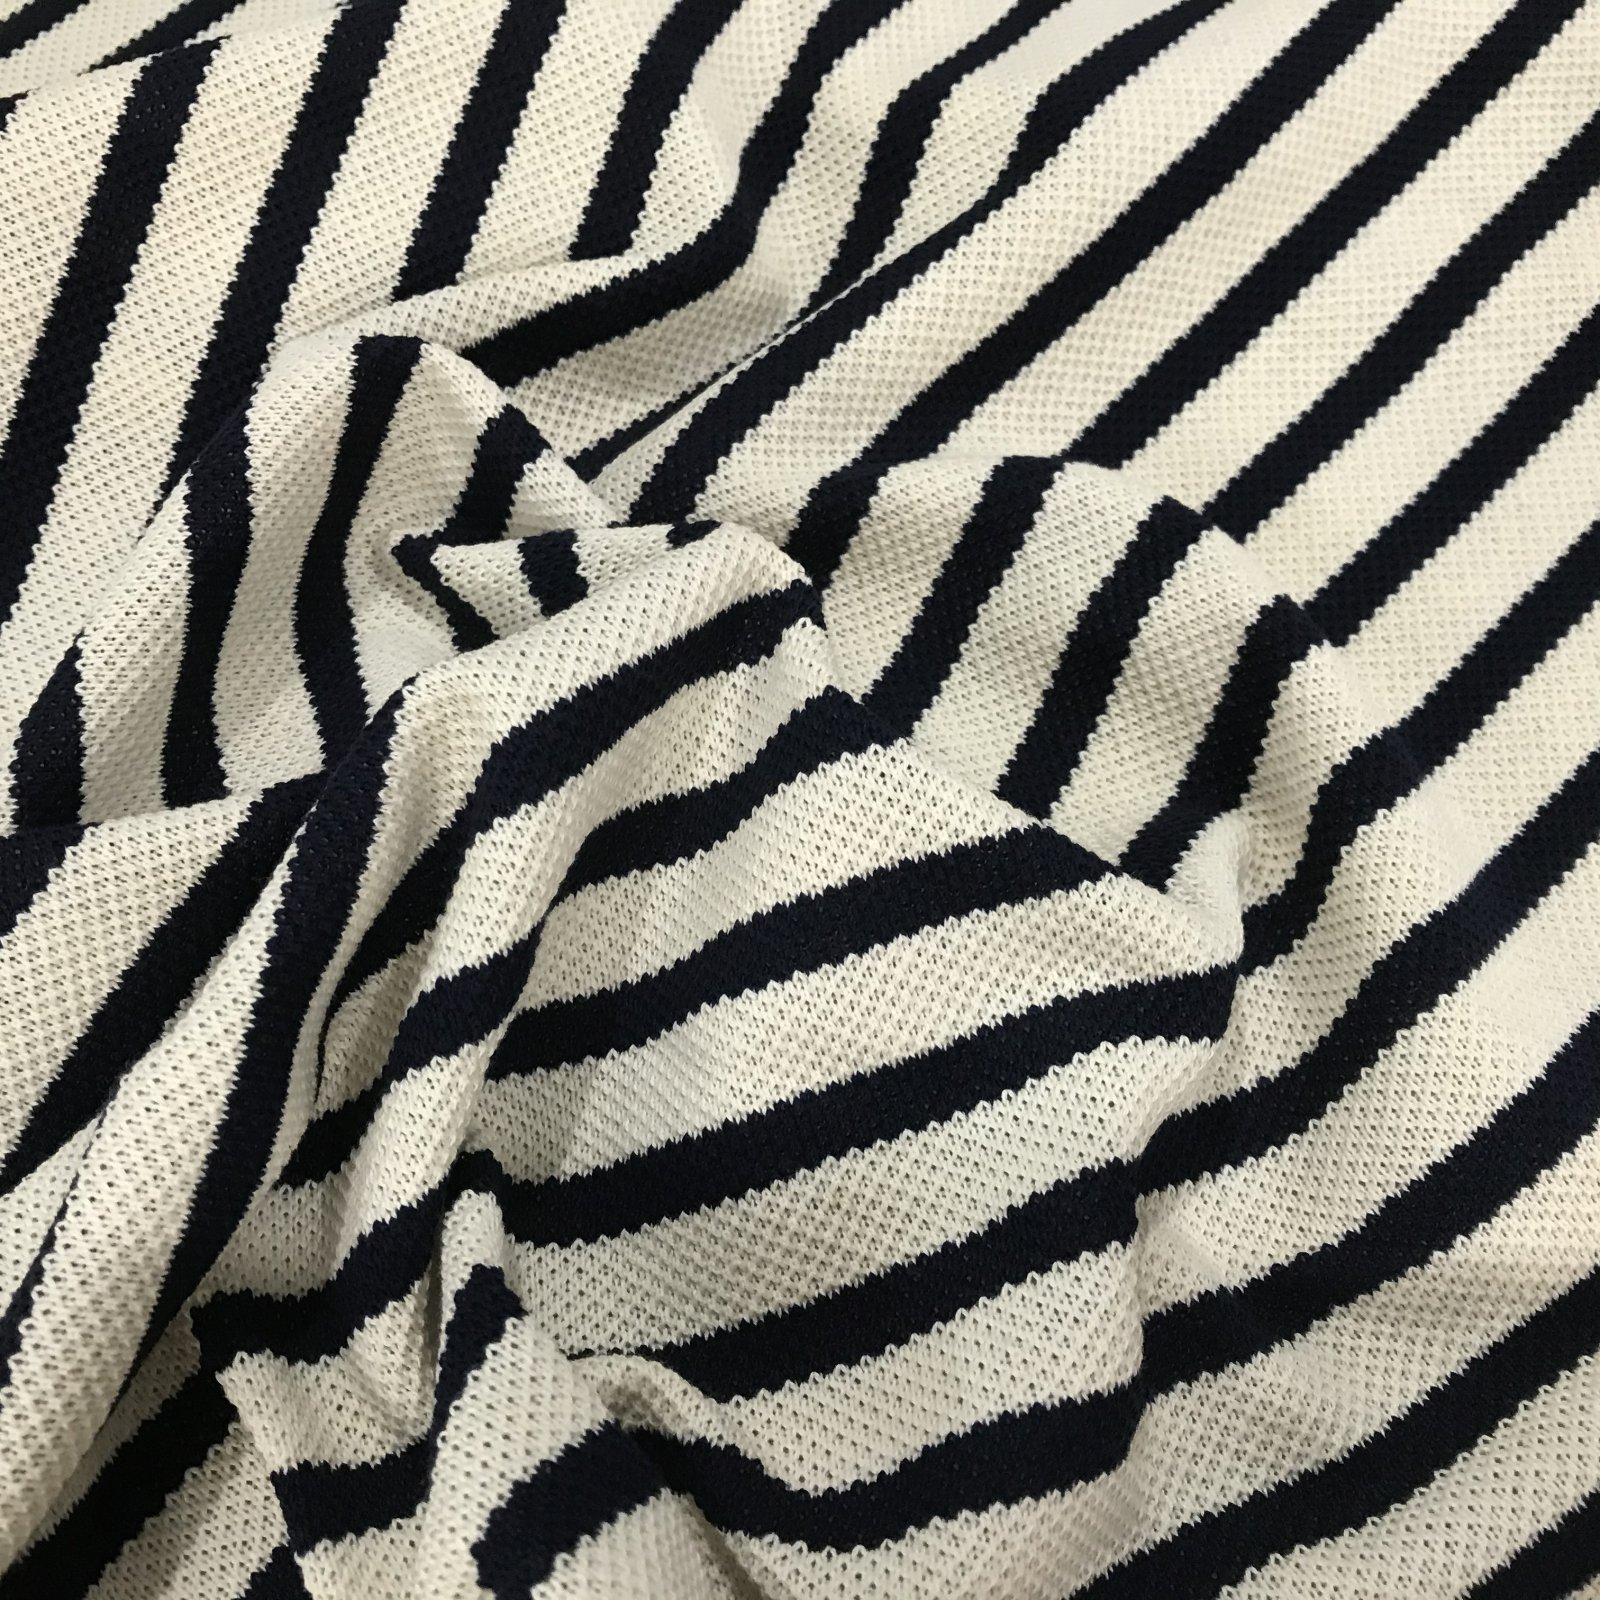 Cotton Knit - Cream and Navy Stripe